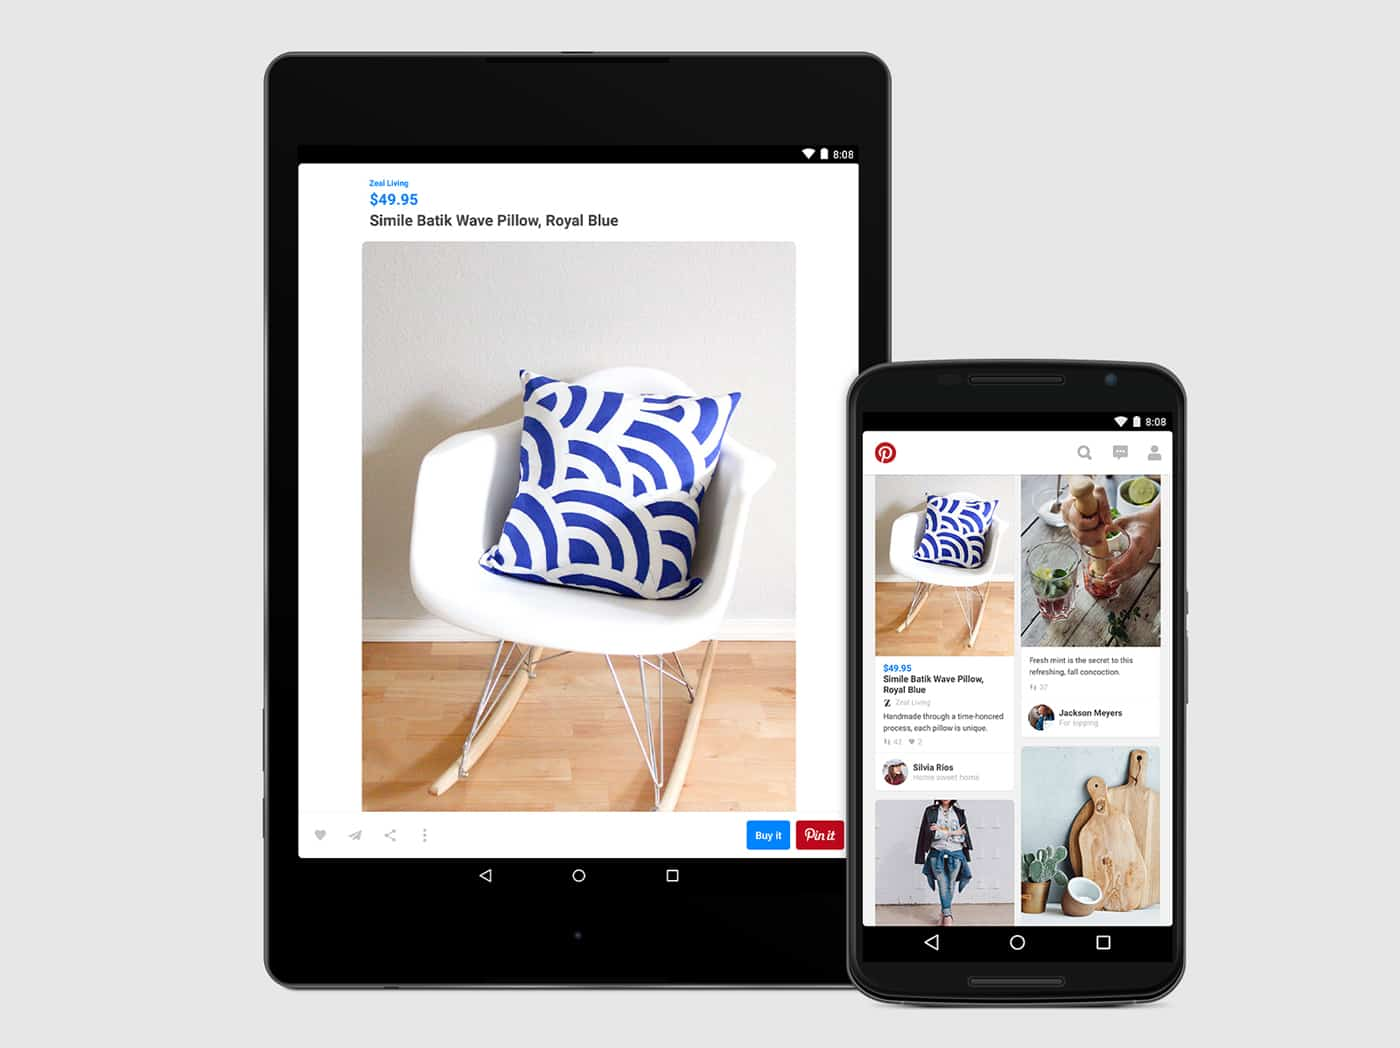 android-buyable-pins-nexus6-nexus9vert-pillow